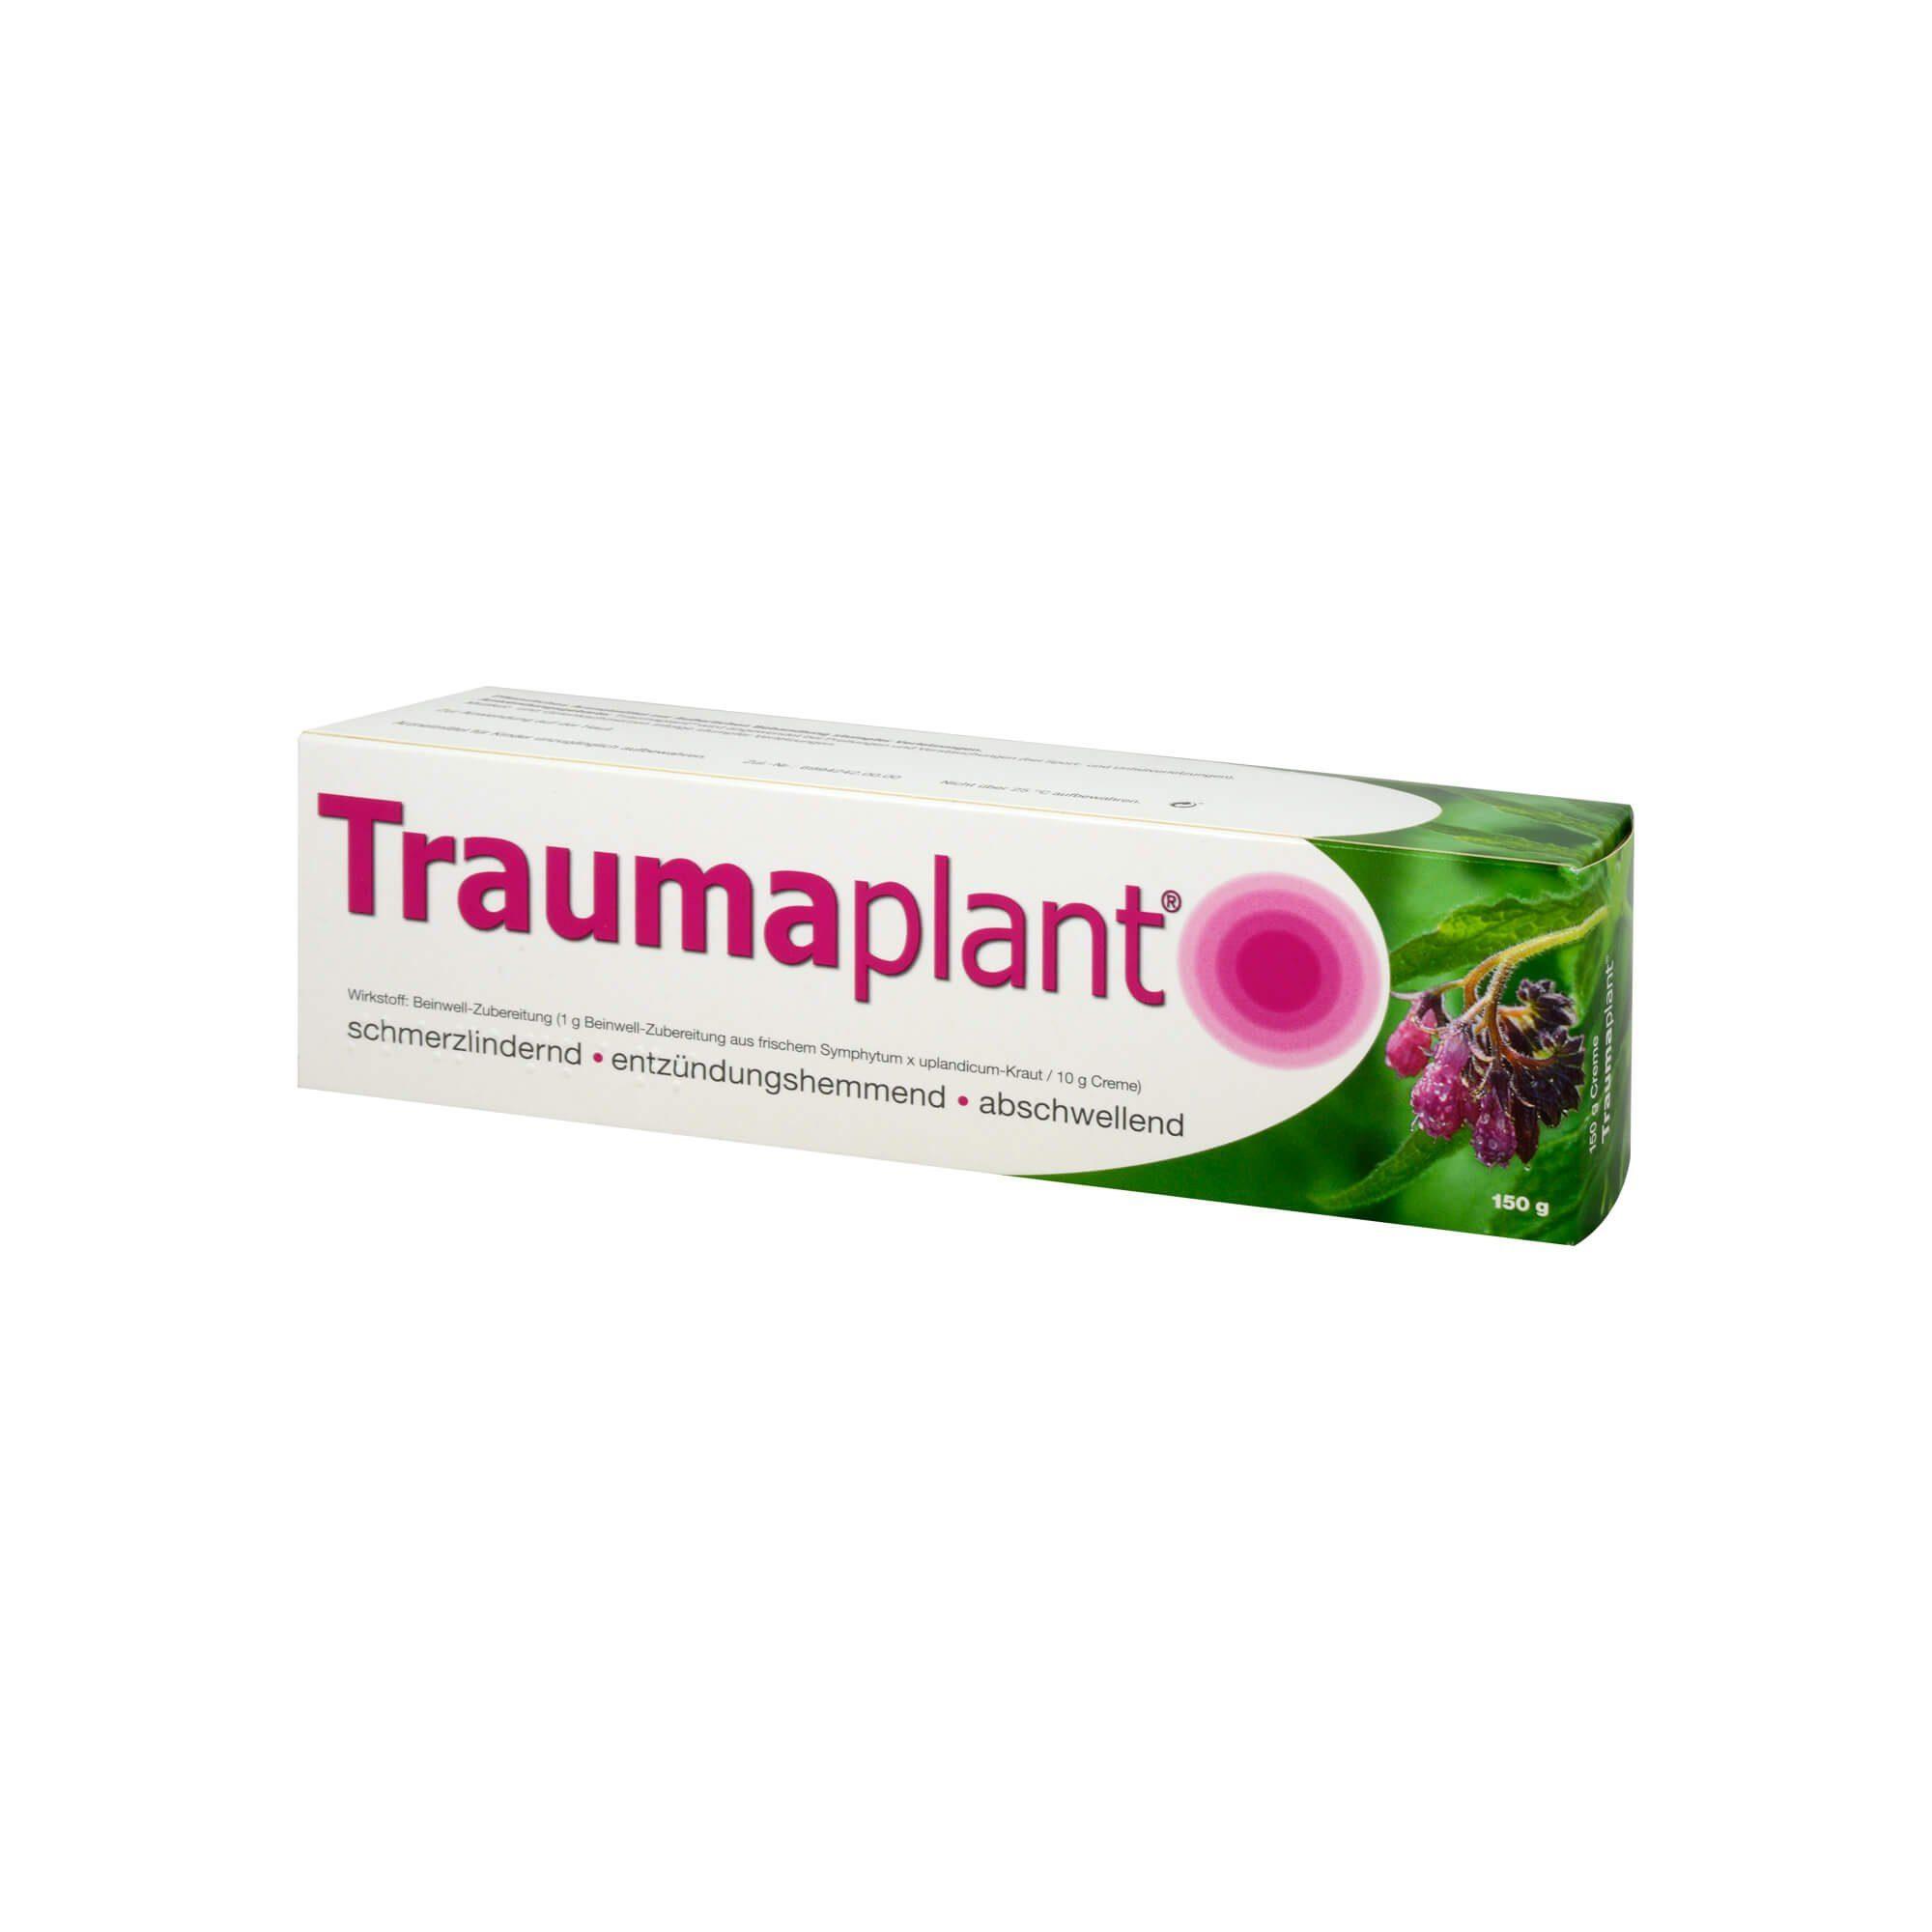 TRAUMAPLANT , 150 g